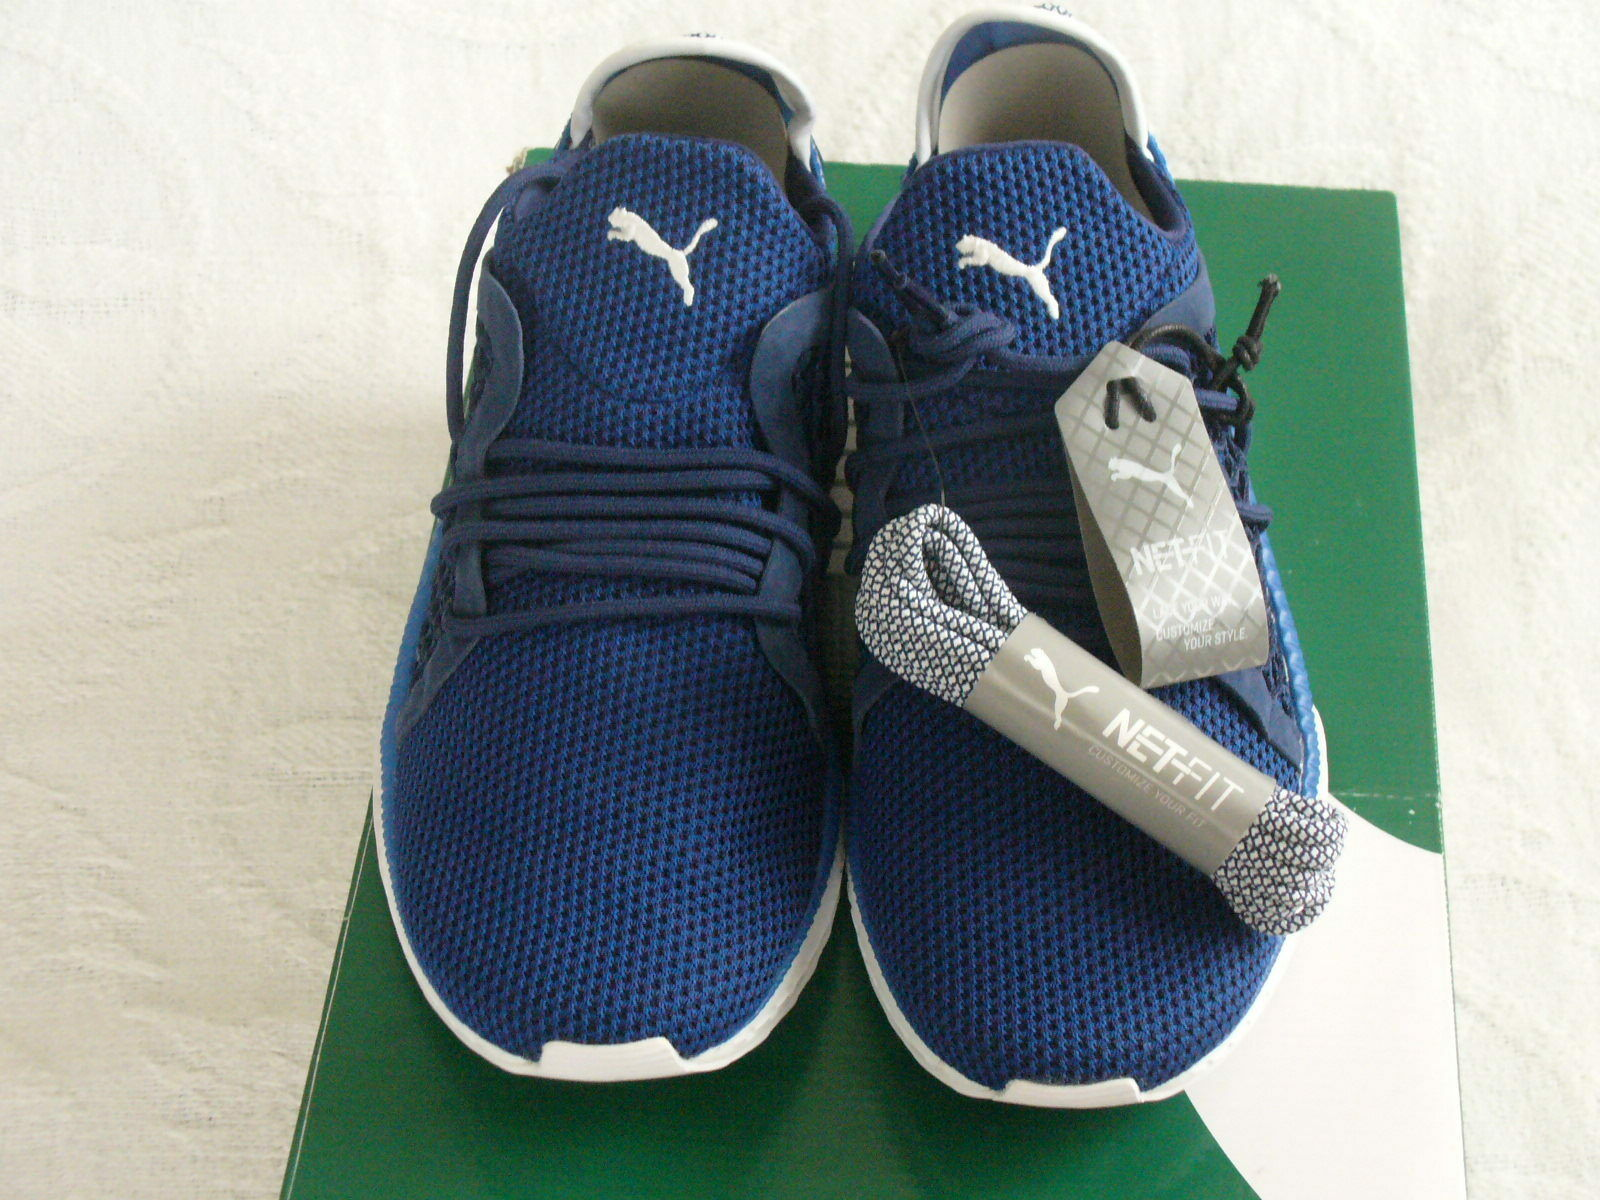 Puma Tsugi Netfit Lace Up Lapis bluee Syn Mesh Men Fitness shoes 364629 03 NWB 9.5